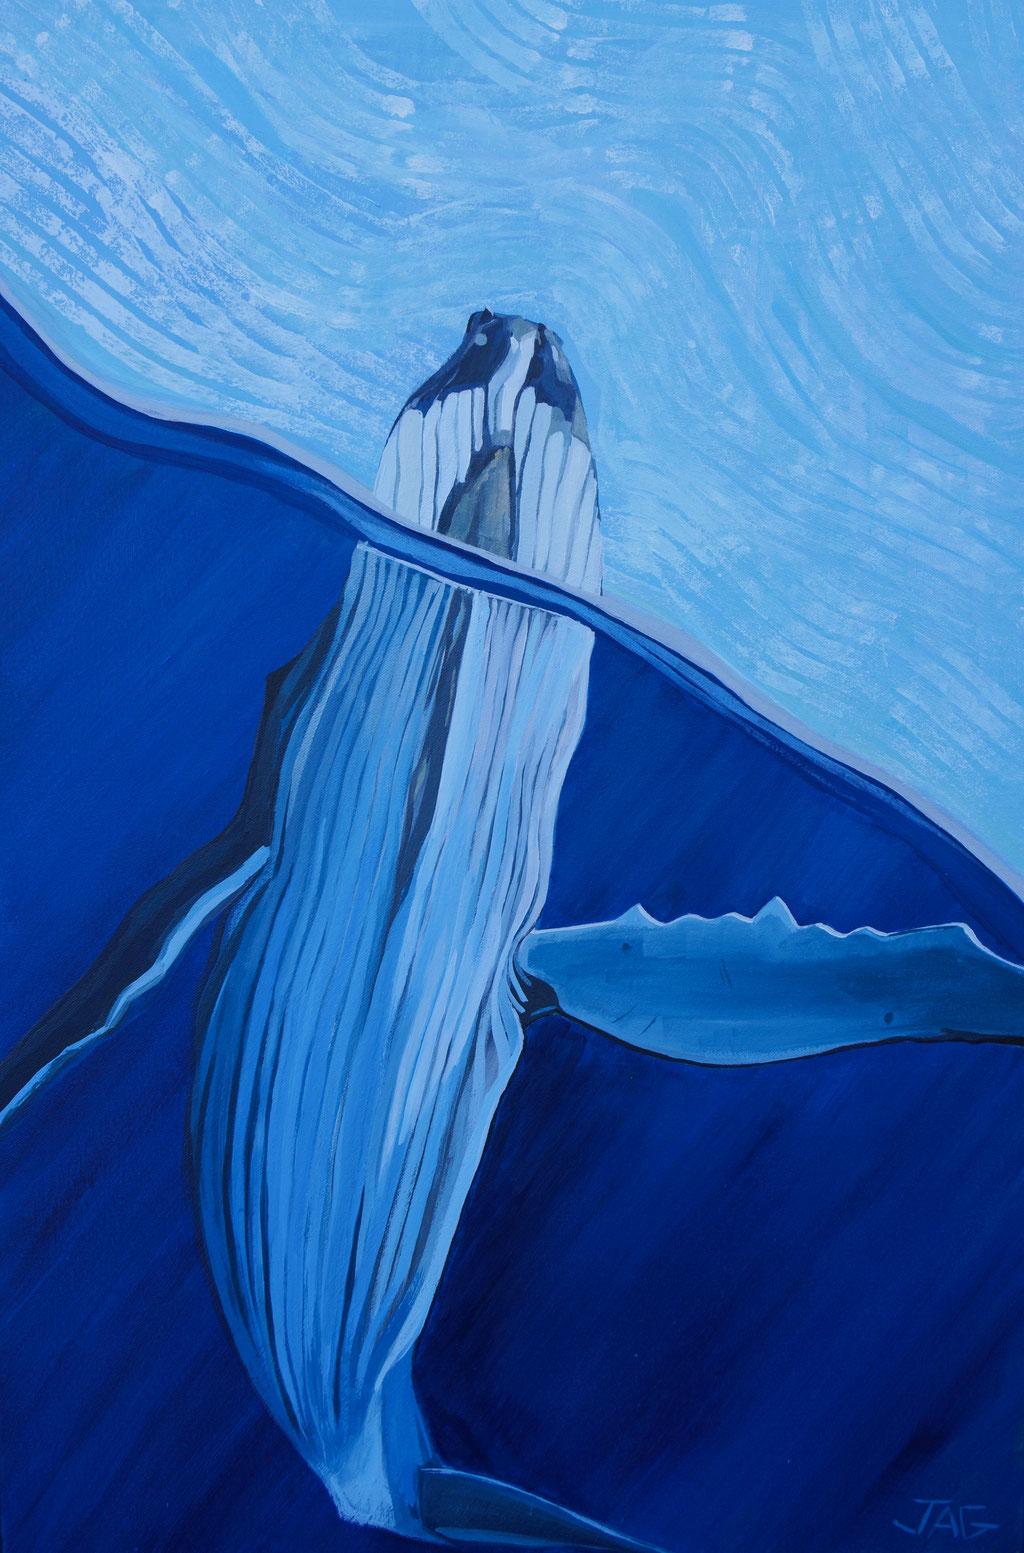 'Helga' acrylic on canvas, 2021, 91 x 61cm - price on request